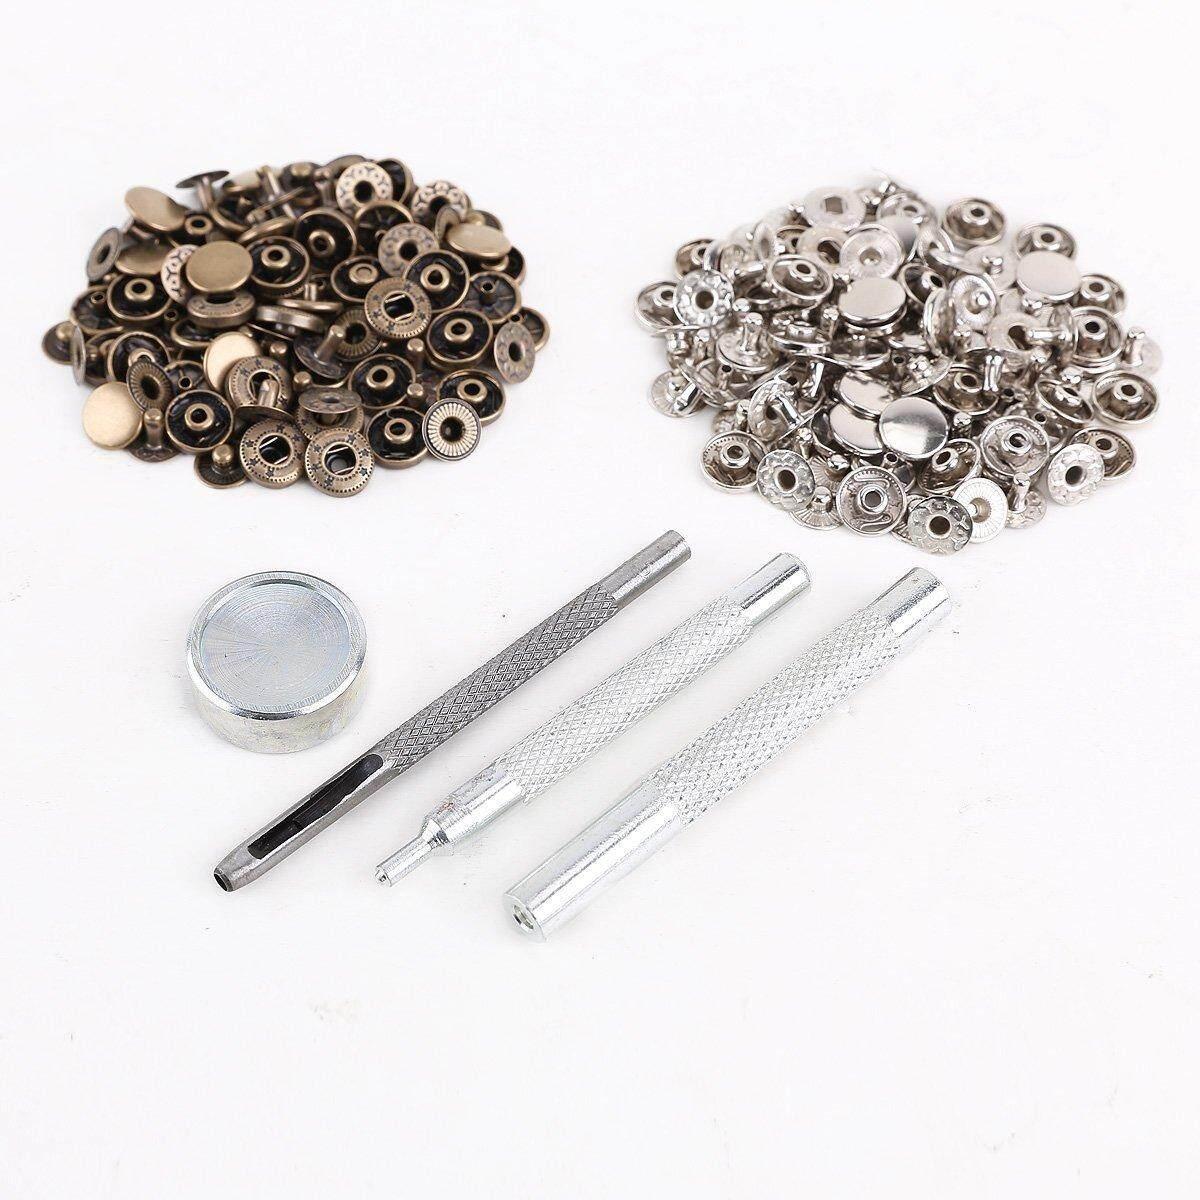 25pcs silver + 25 pcs bronze 10mm Snap Button Metal + tool set for leather handbags